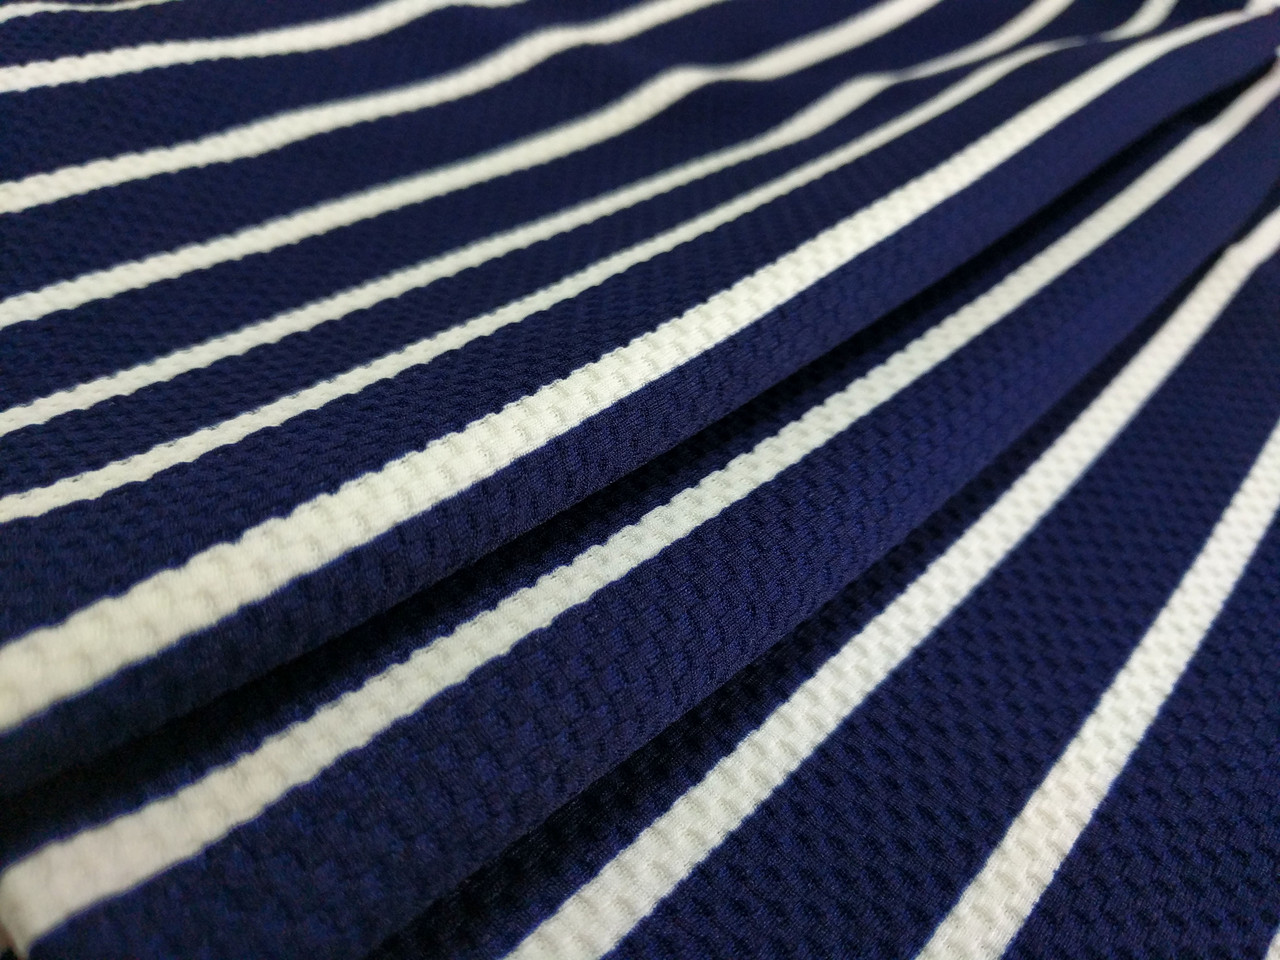 Трикотаж венский рисунок полоска, темно-синий